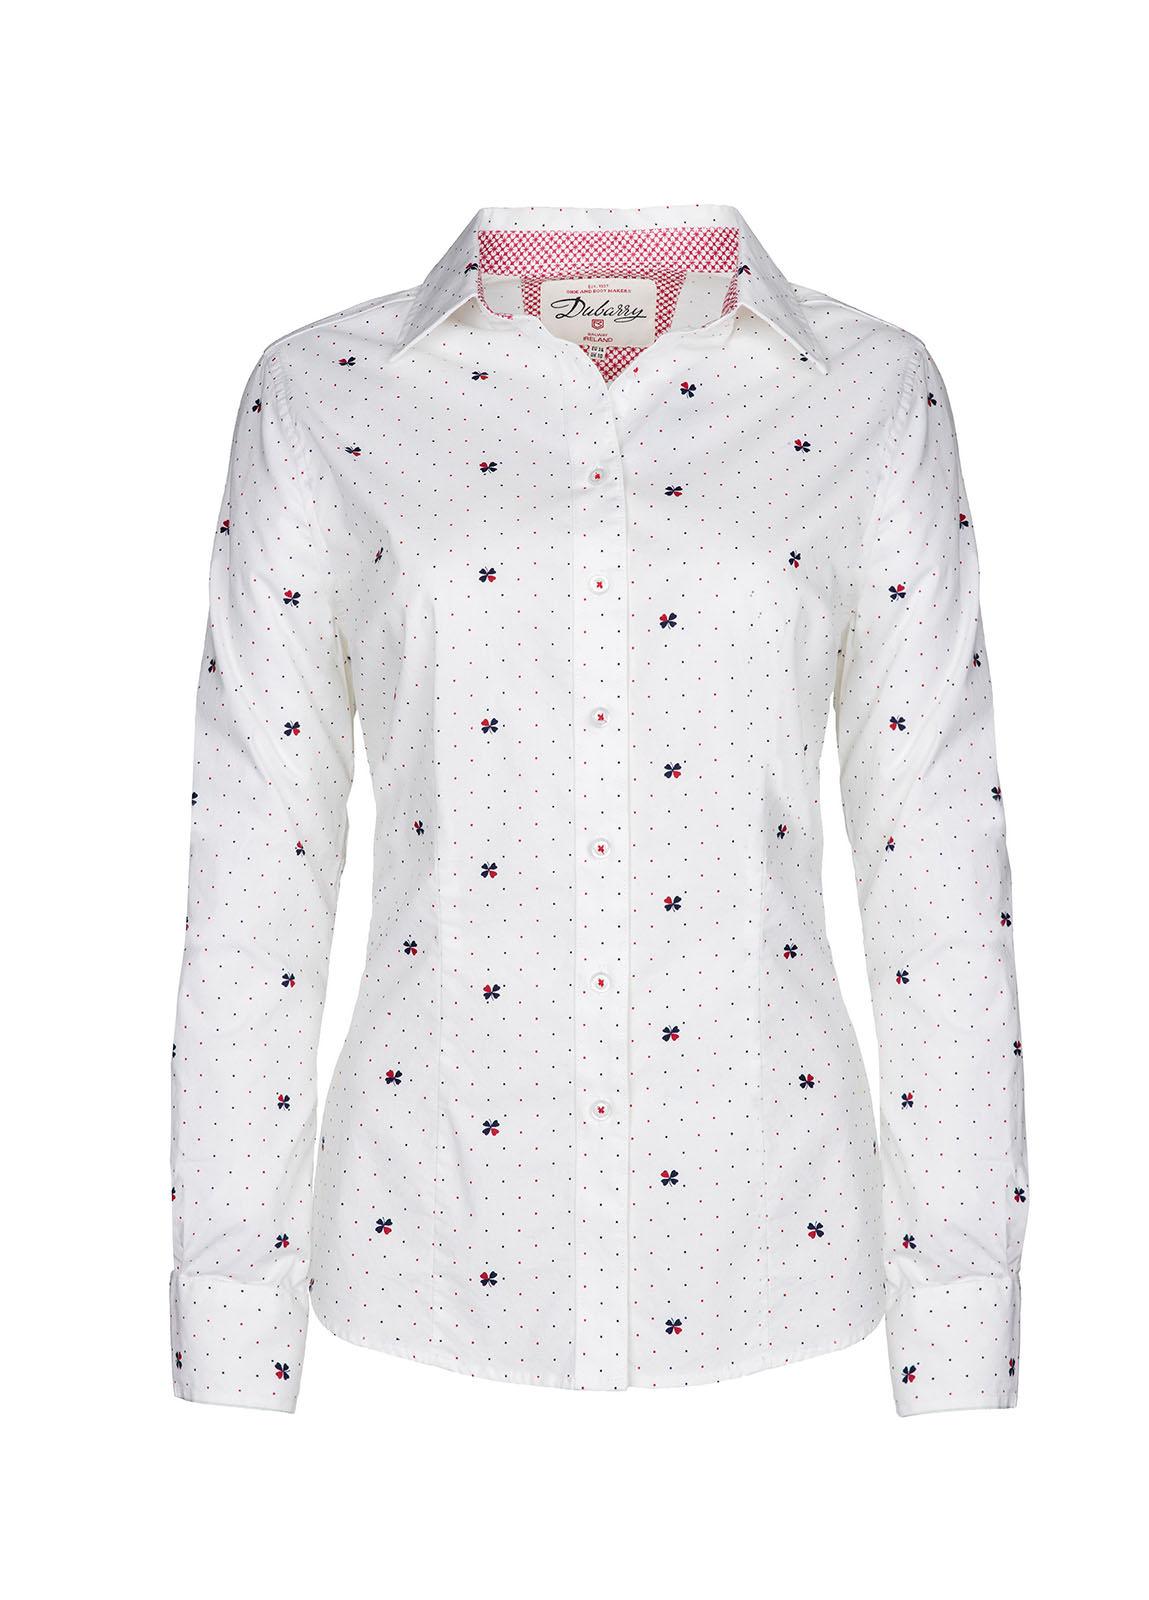 Dubarry_ Azalea Printed Shirt - Sail White_Image_2